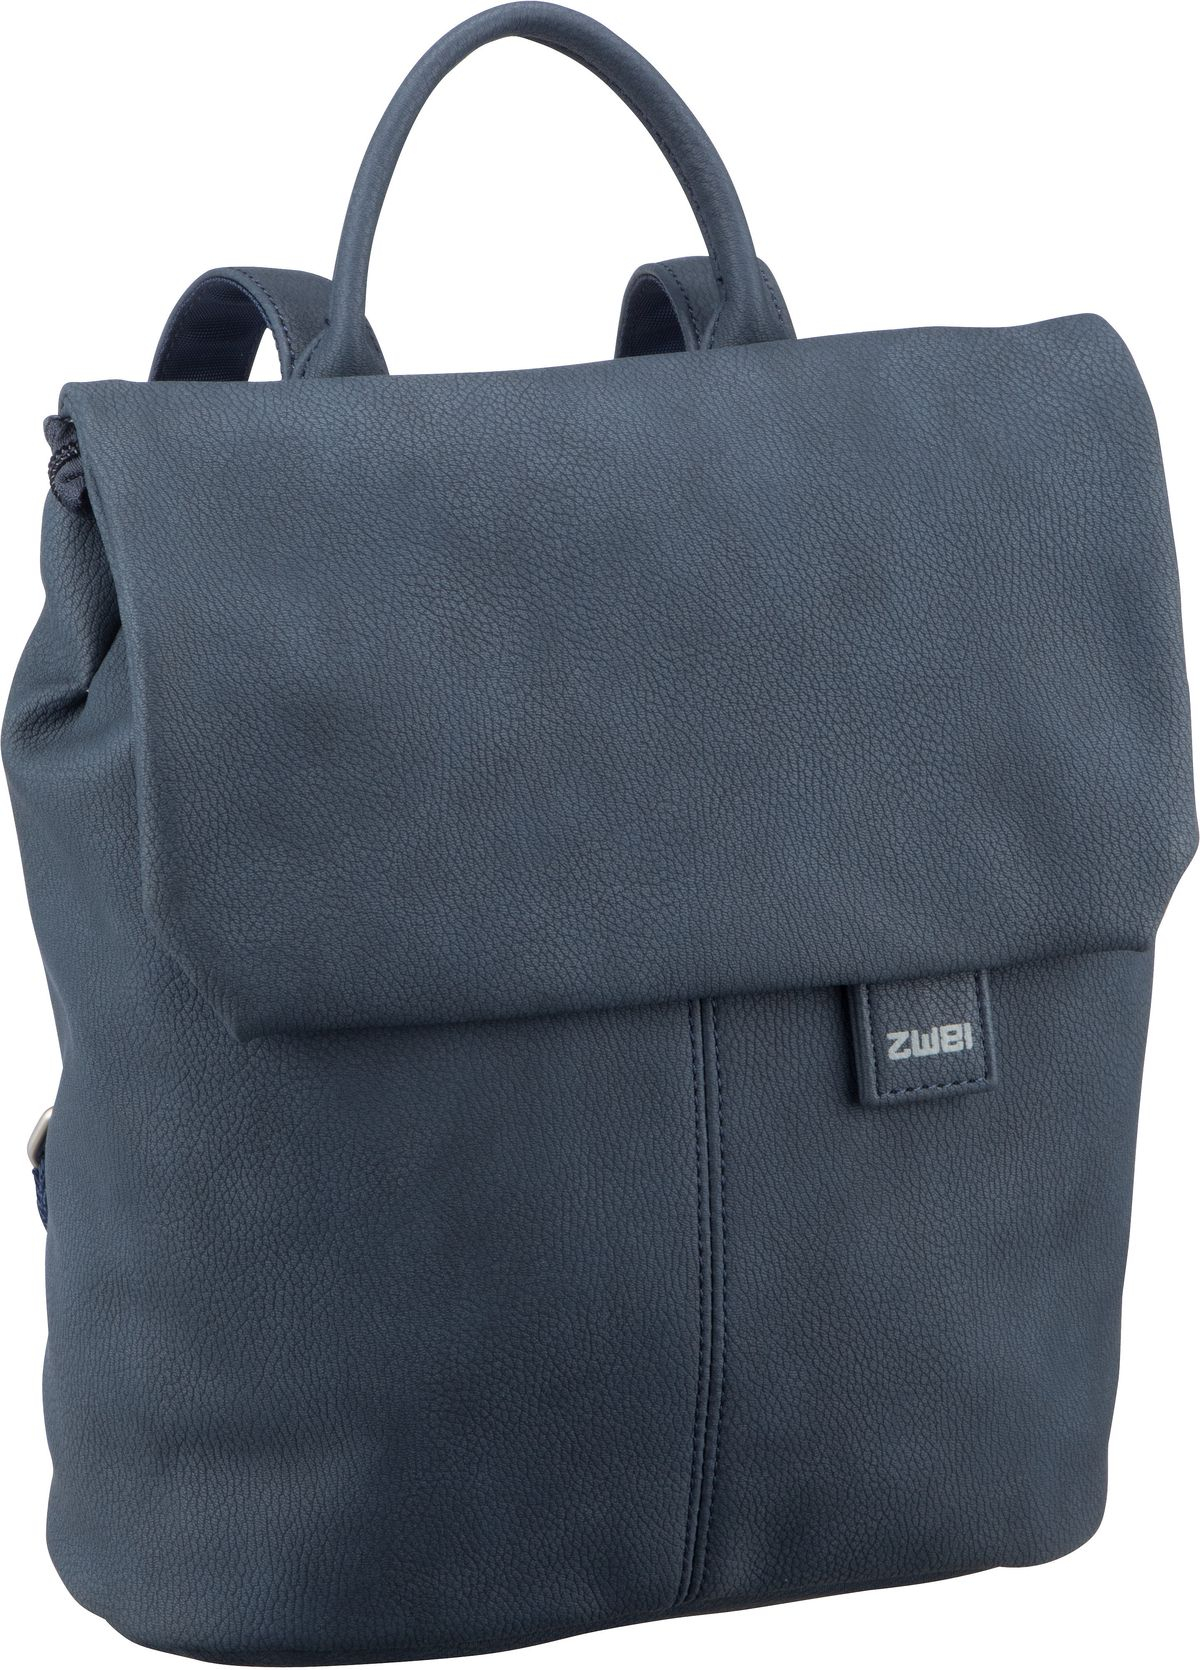 Rucksack / Daypack Mademoiselle MR8 Nubuk/Blue (4 Liter)